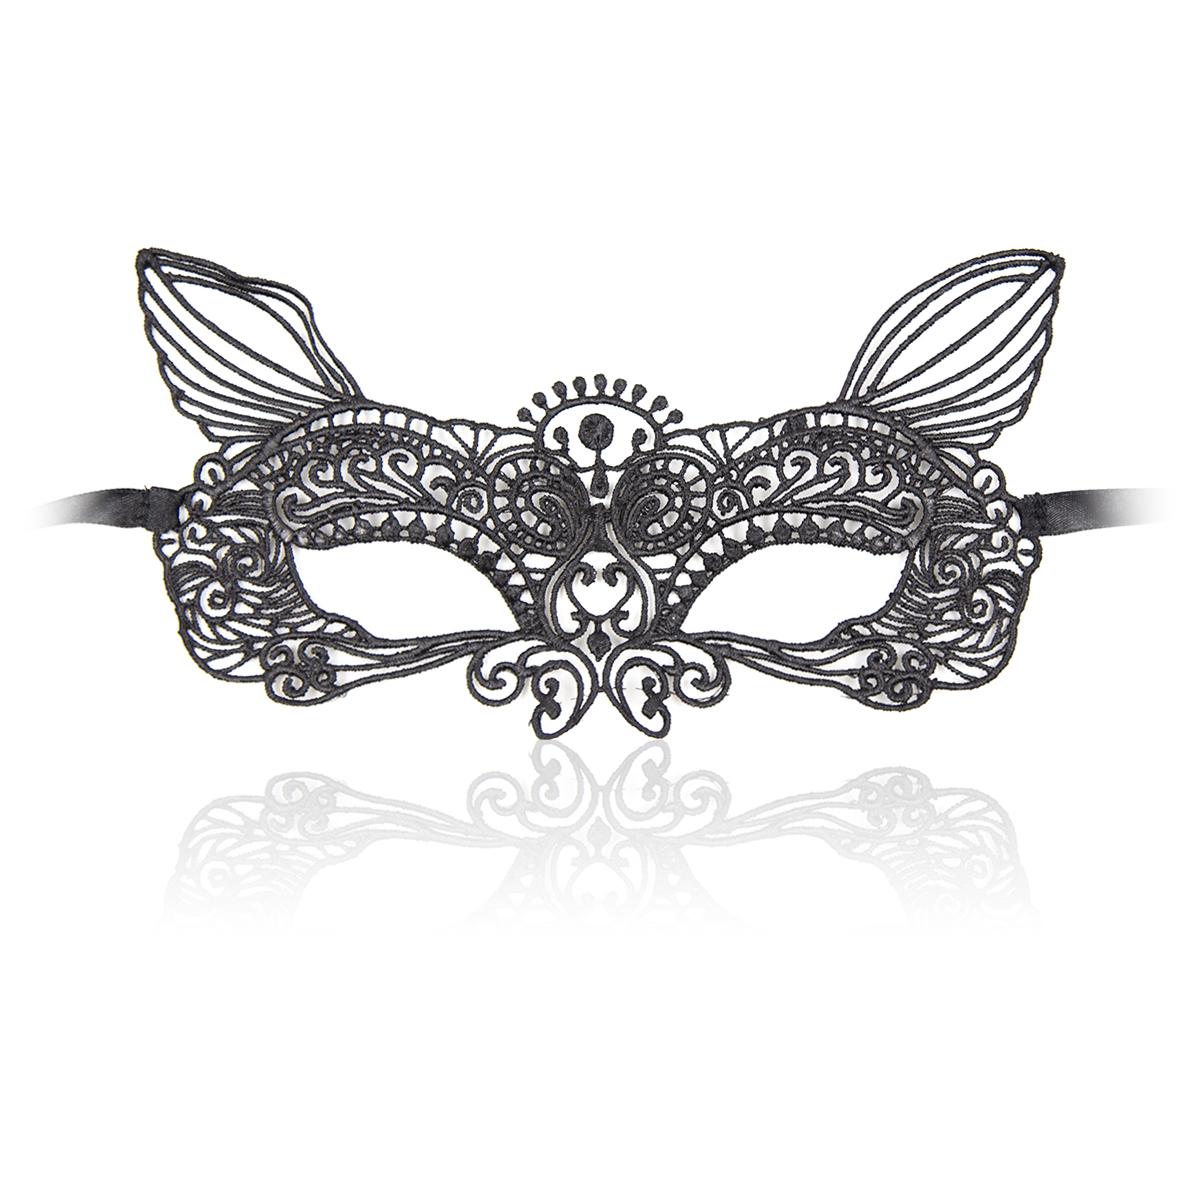 Роскошная черная кружевная маска